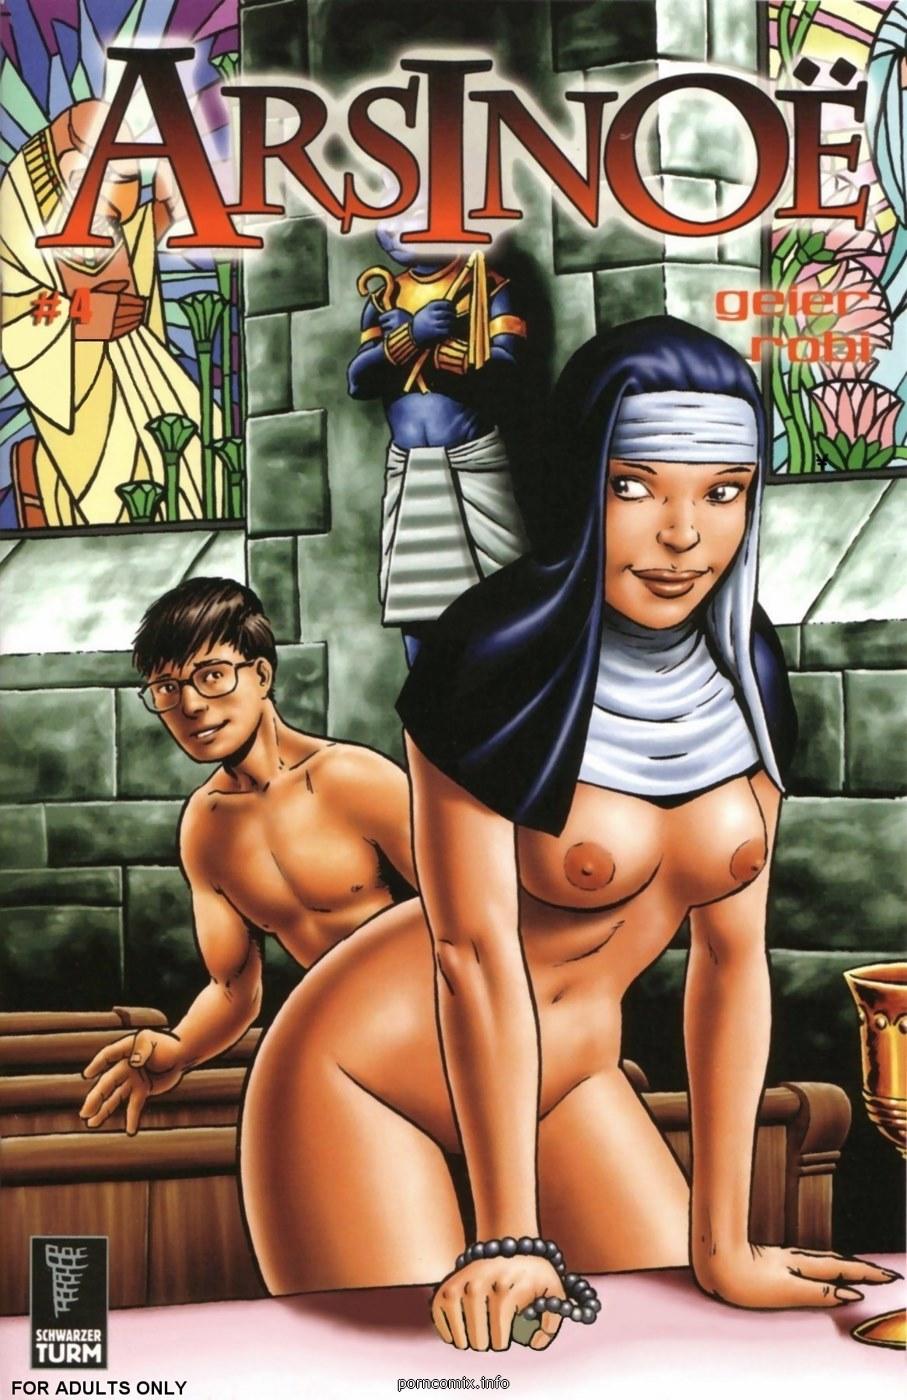 Porn Comics - Arsinoe 4- Bastet (Geier Robi) porn comics 8 muses